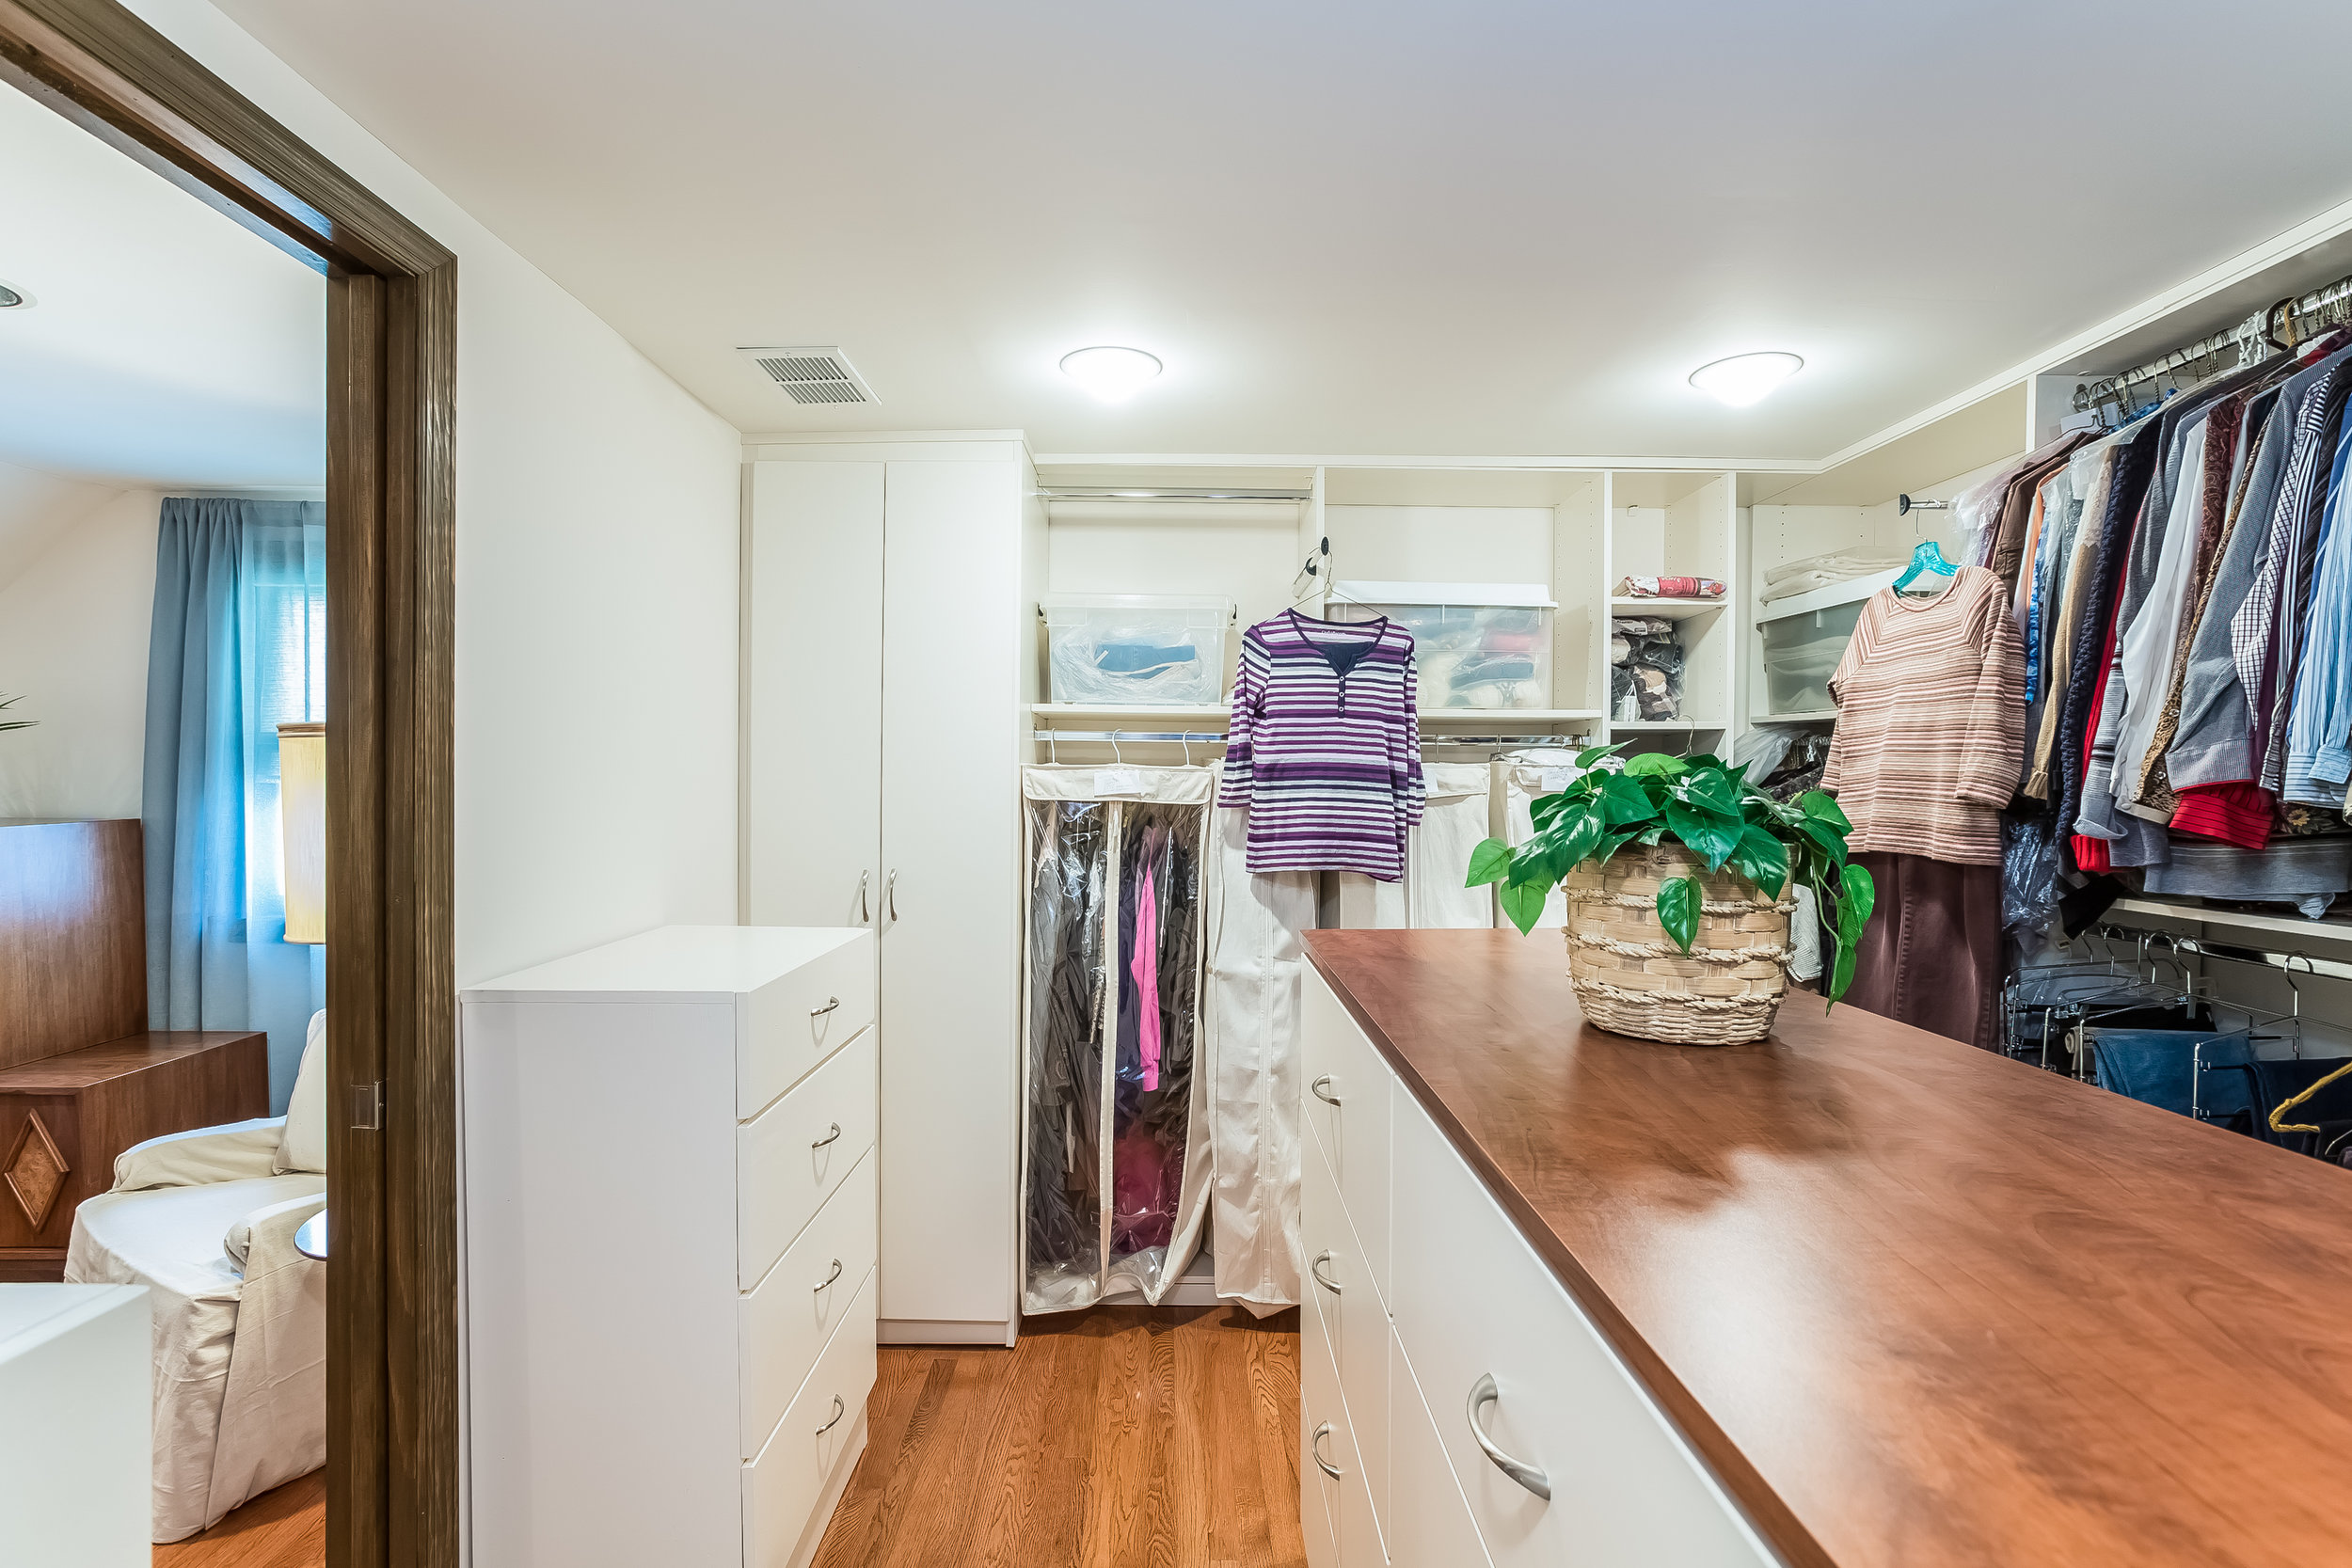 046-Walk_In_Closet-4932704-large.jpg